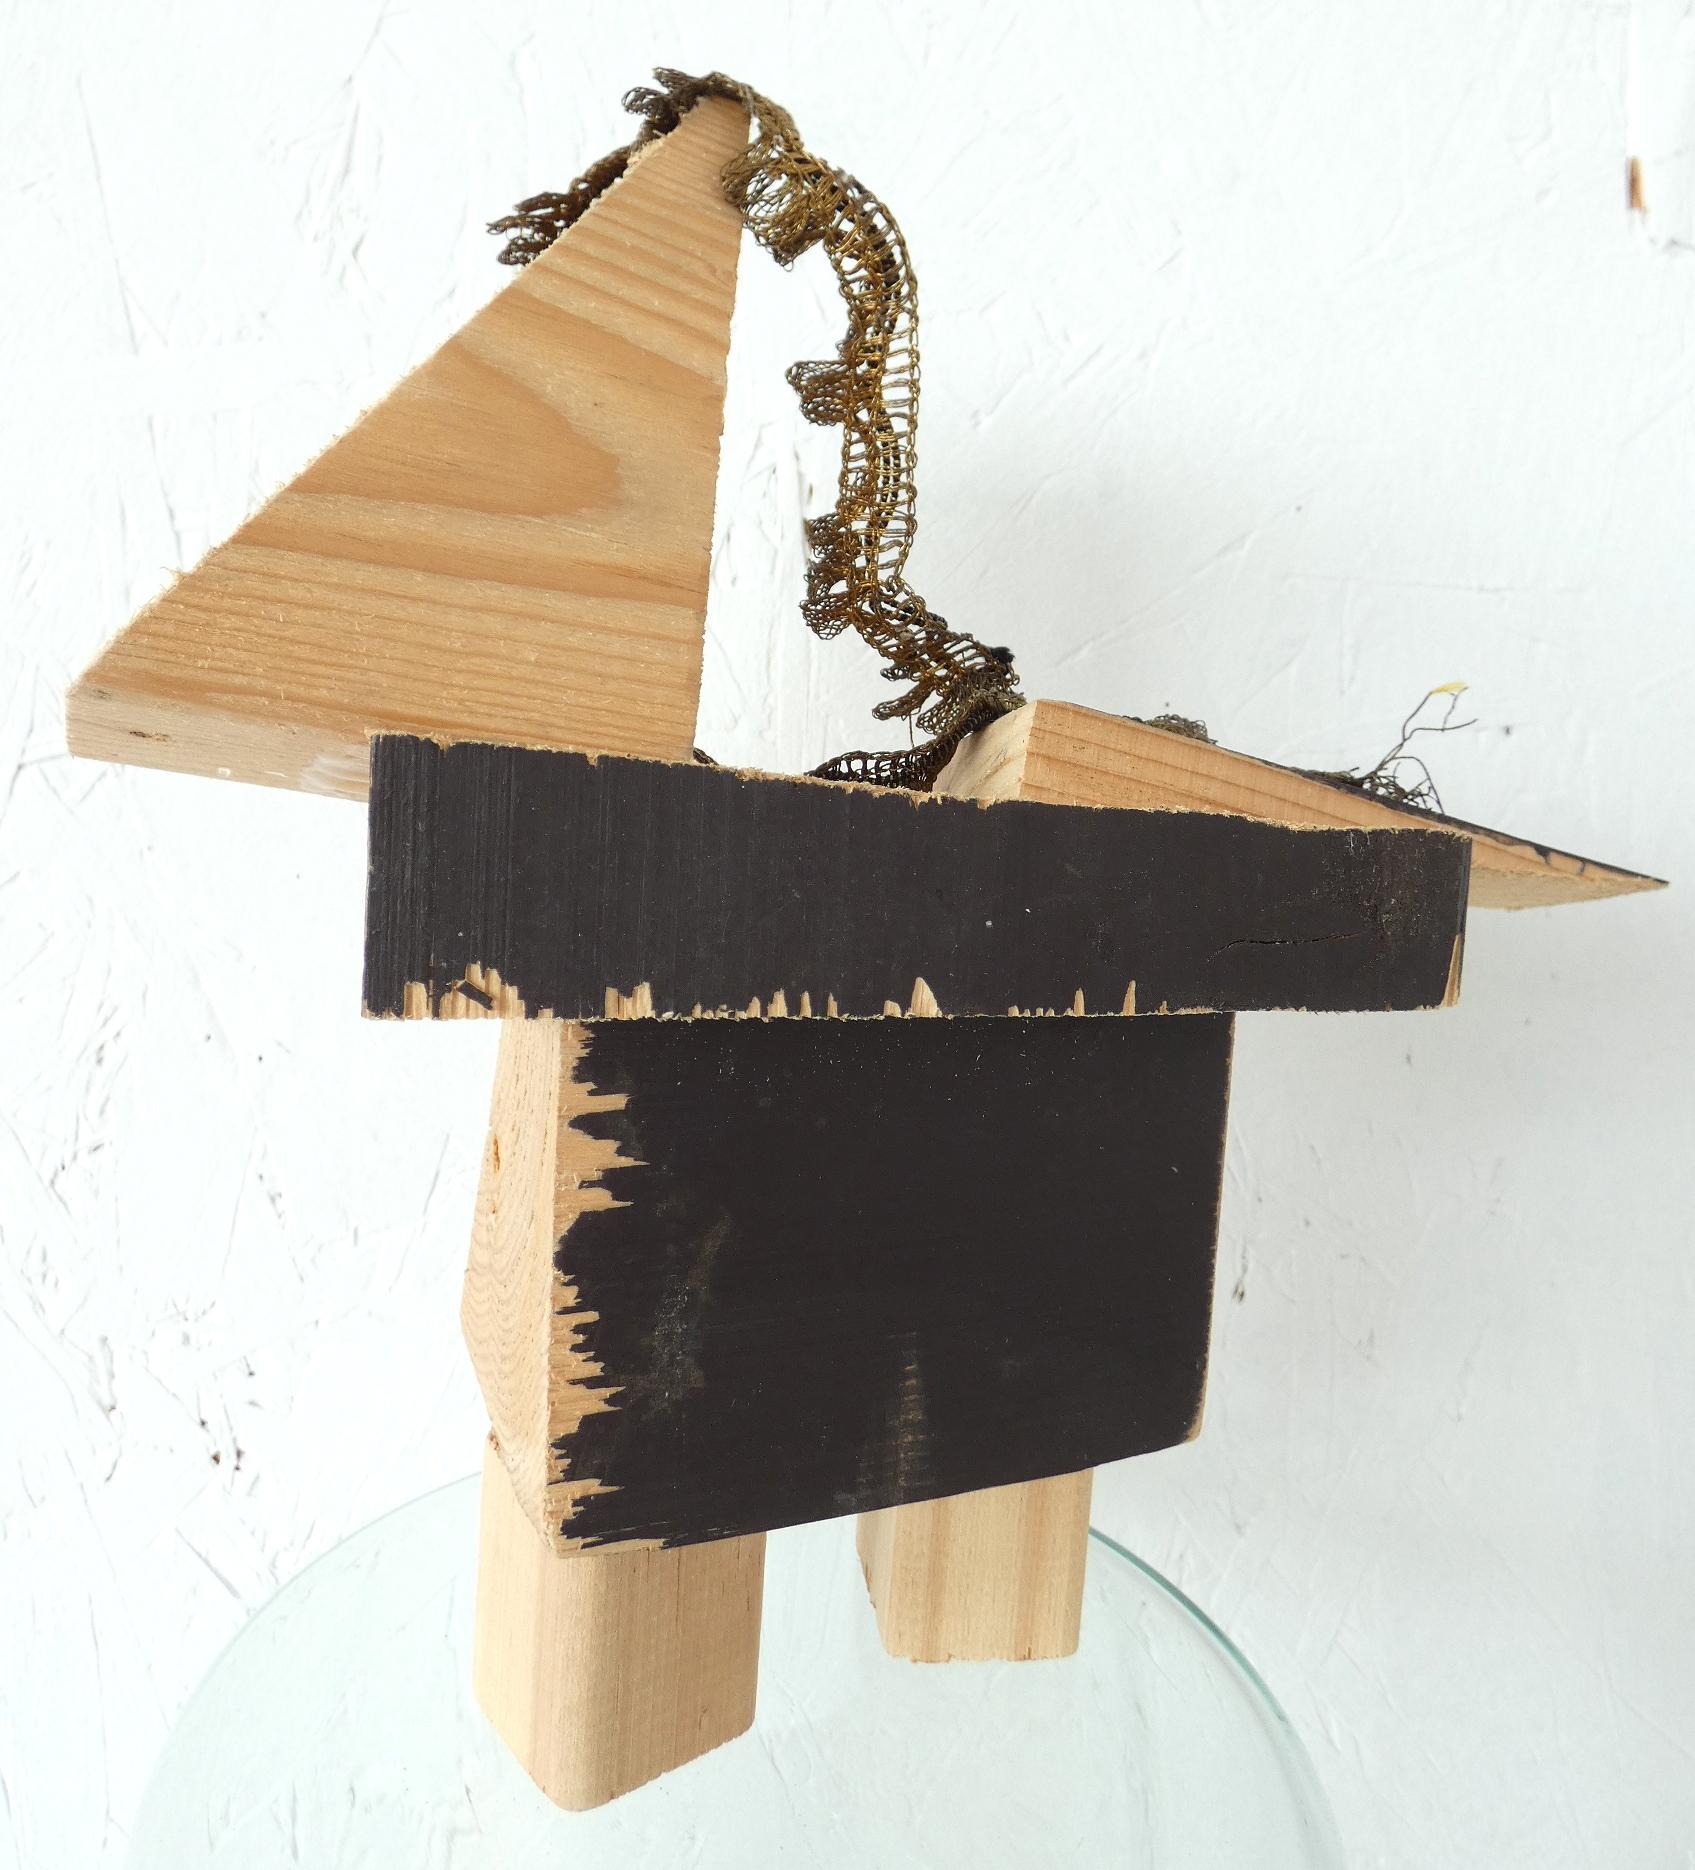 Antiek paardje, antique horse, kunstbeeld, artwork, artlovers, hout, gouden kant, kunst kopen, mixed media, sculptuur, kunstenaar Wietske Lycklama à Nijeholt